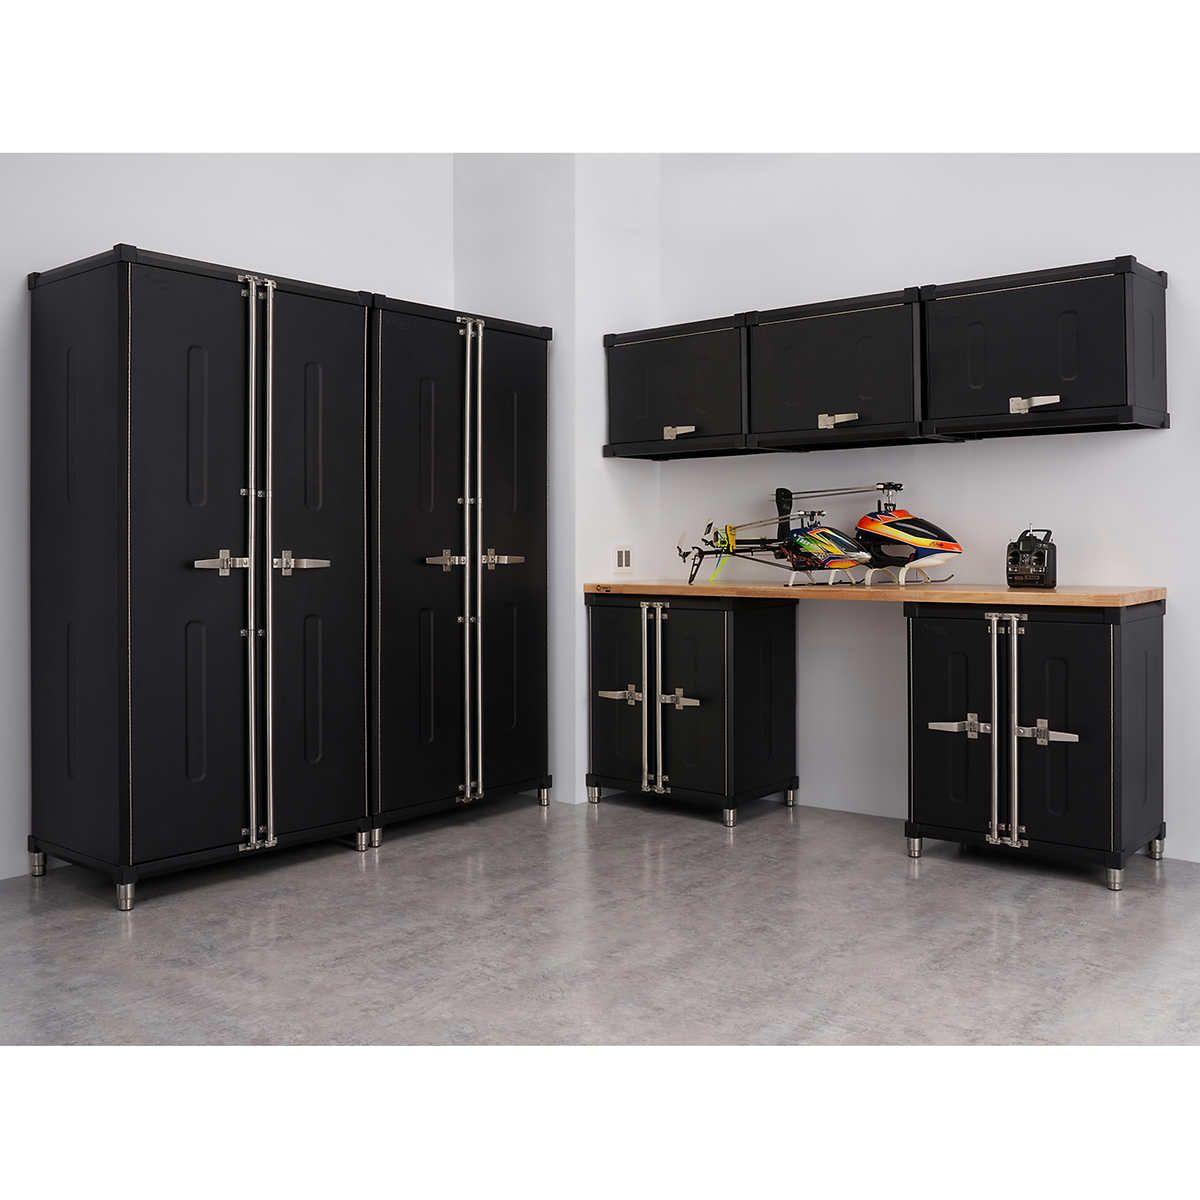 Trinity Pro 8 Piece Welded Garage Cabinet Set In 2020 Garage Cabinets Storage Cabinets Garage Storage